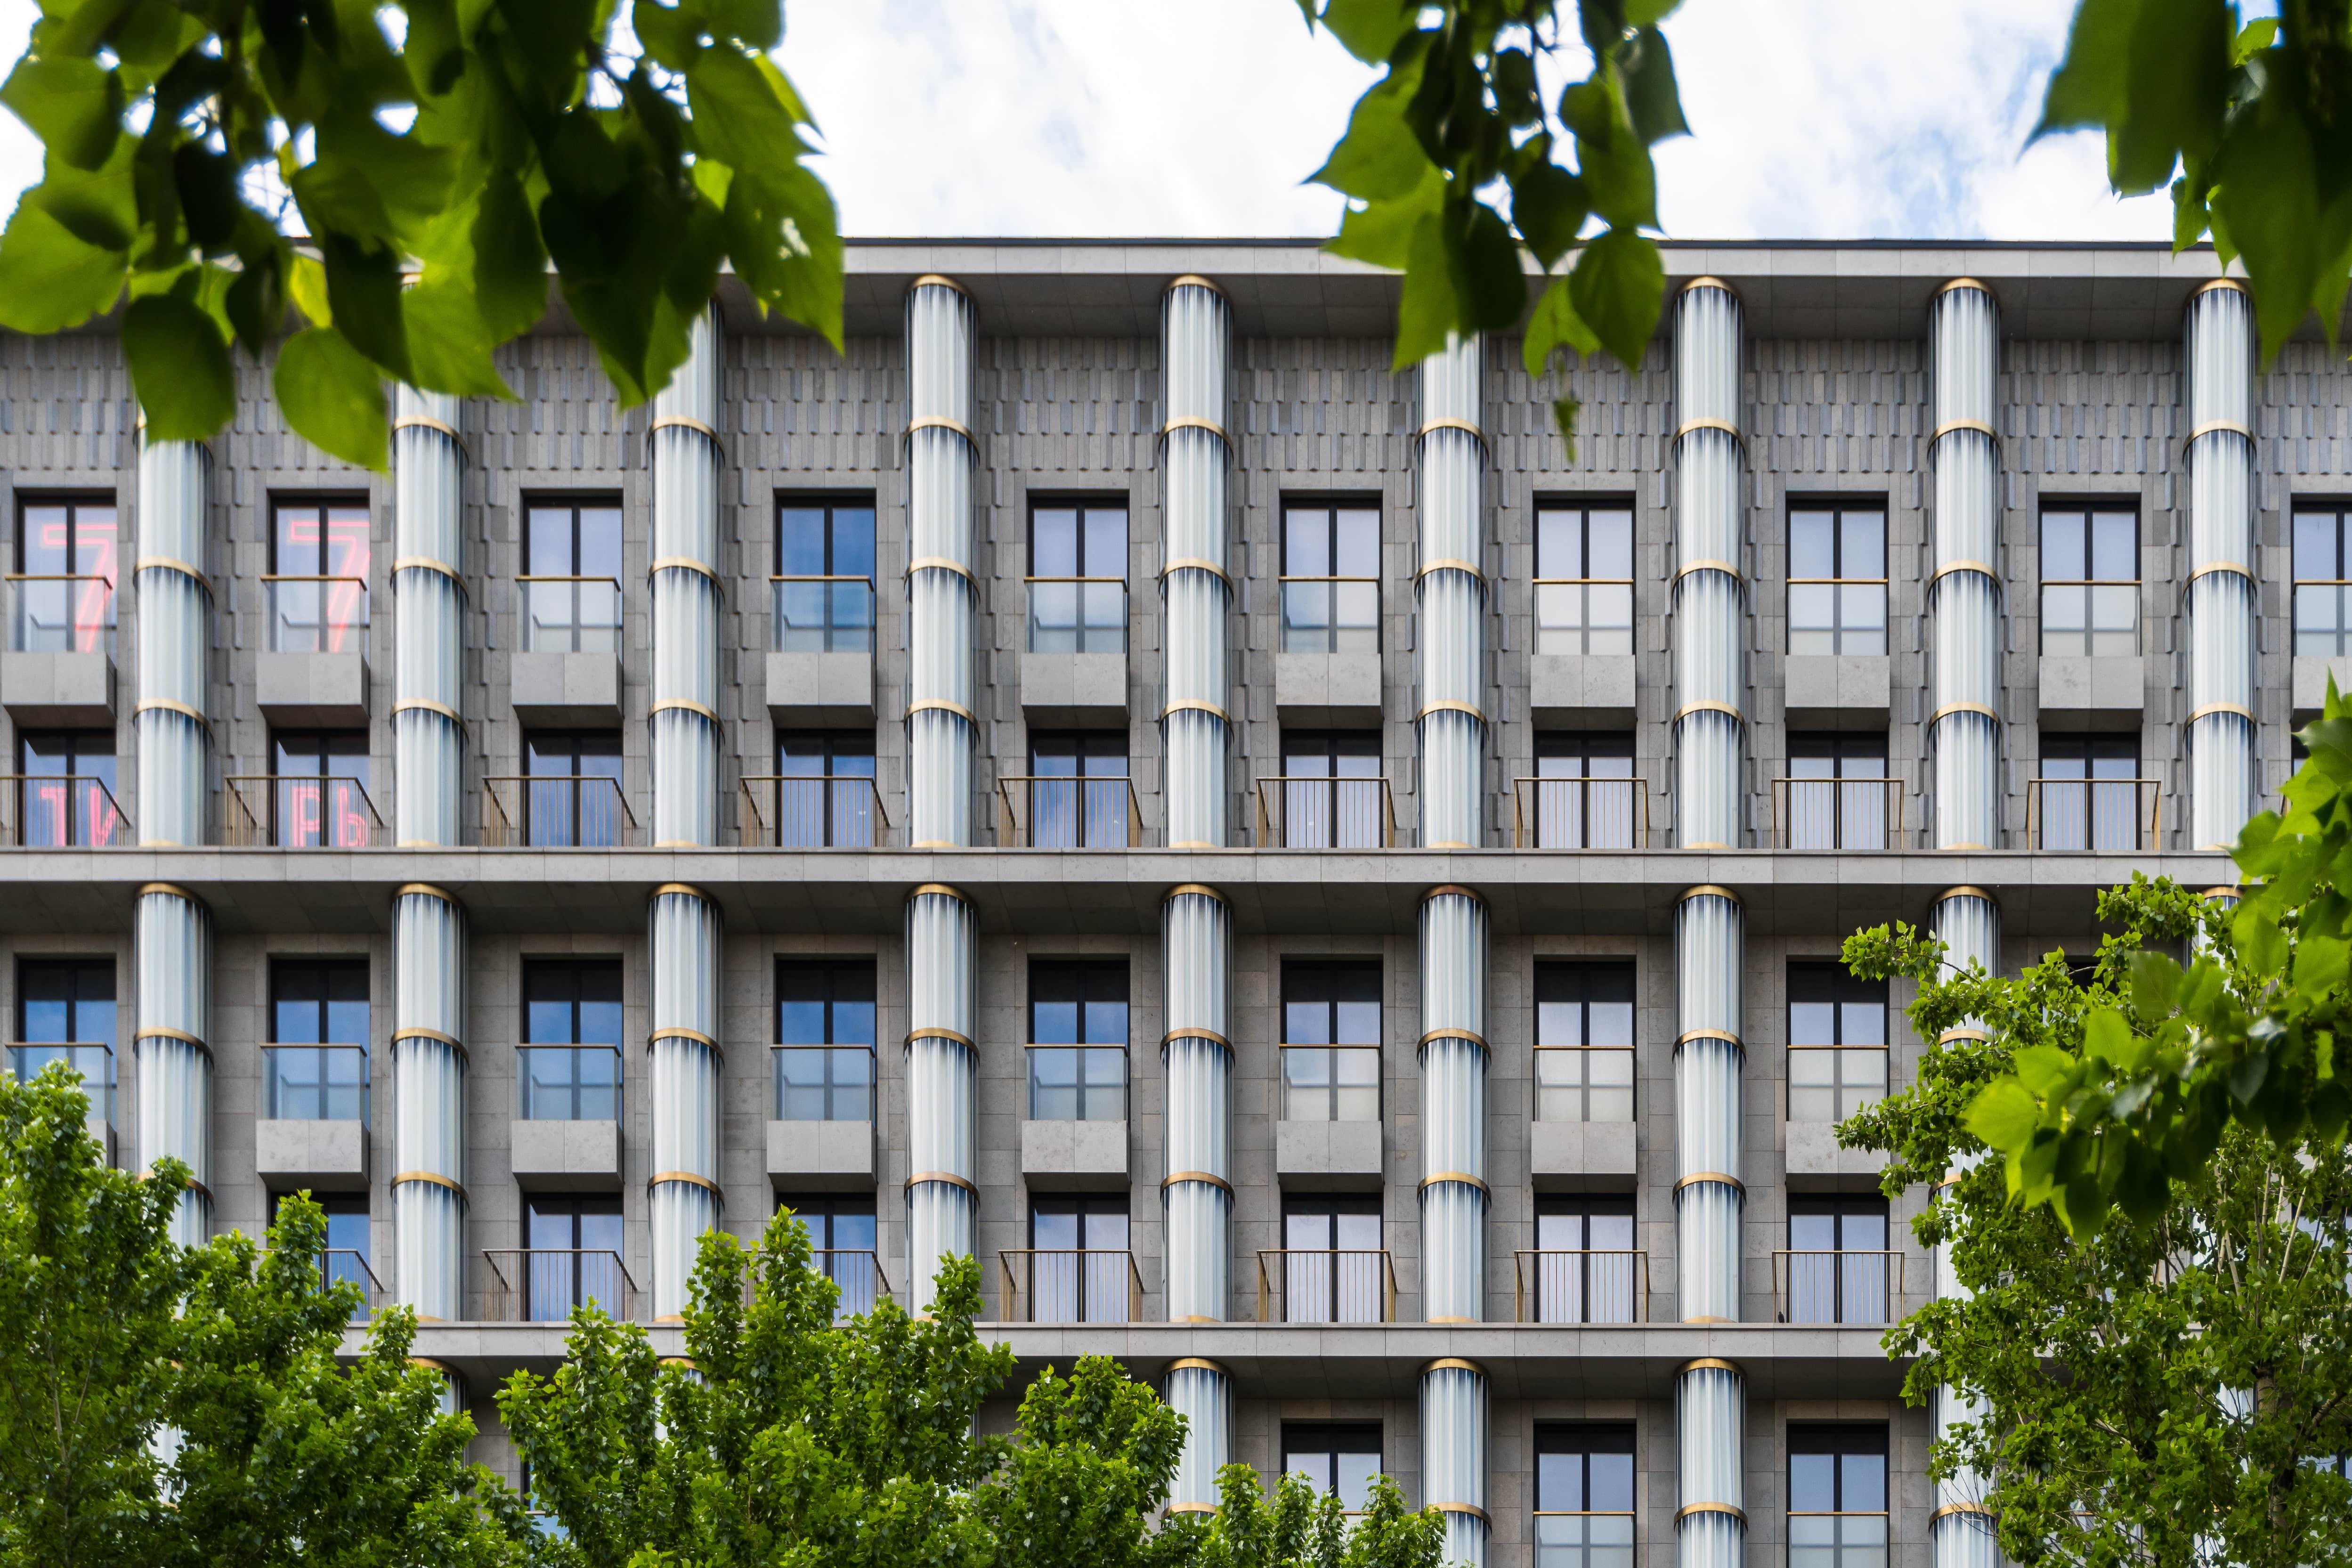 Кутузовский, 12 архитектура